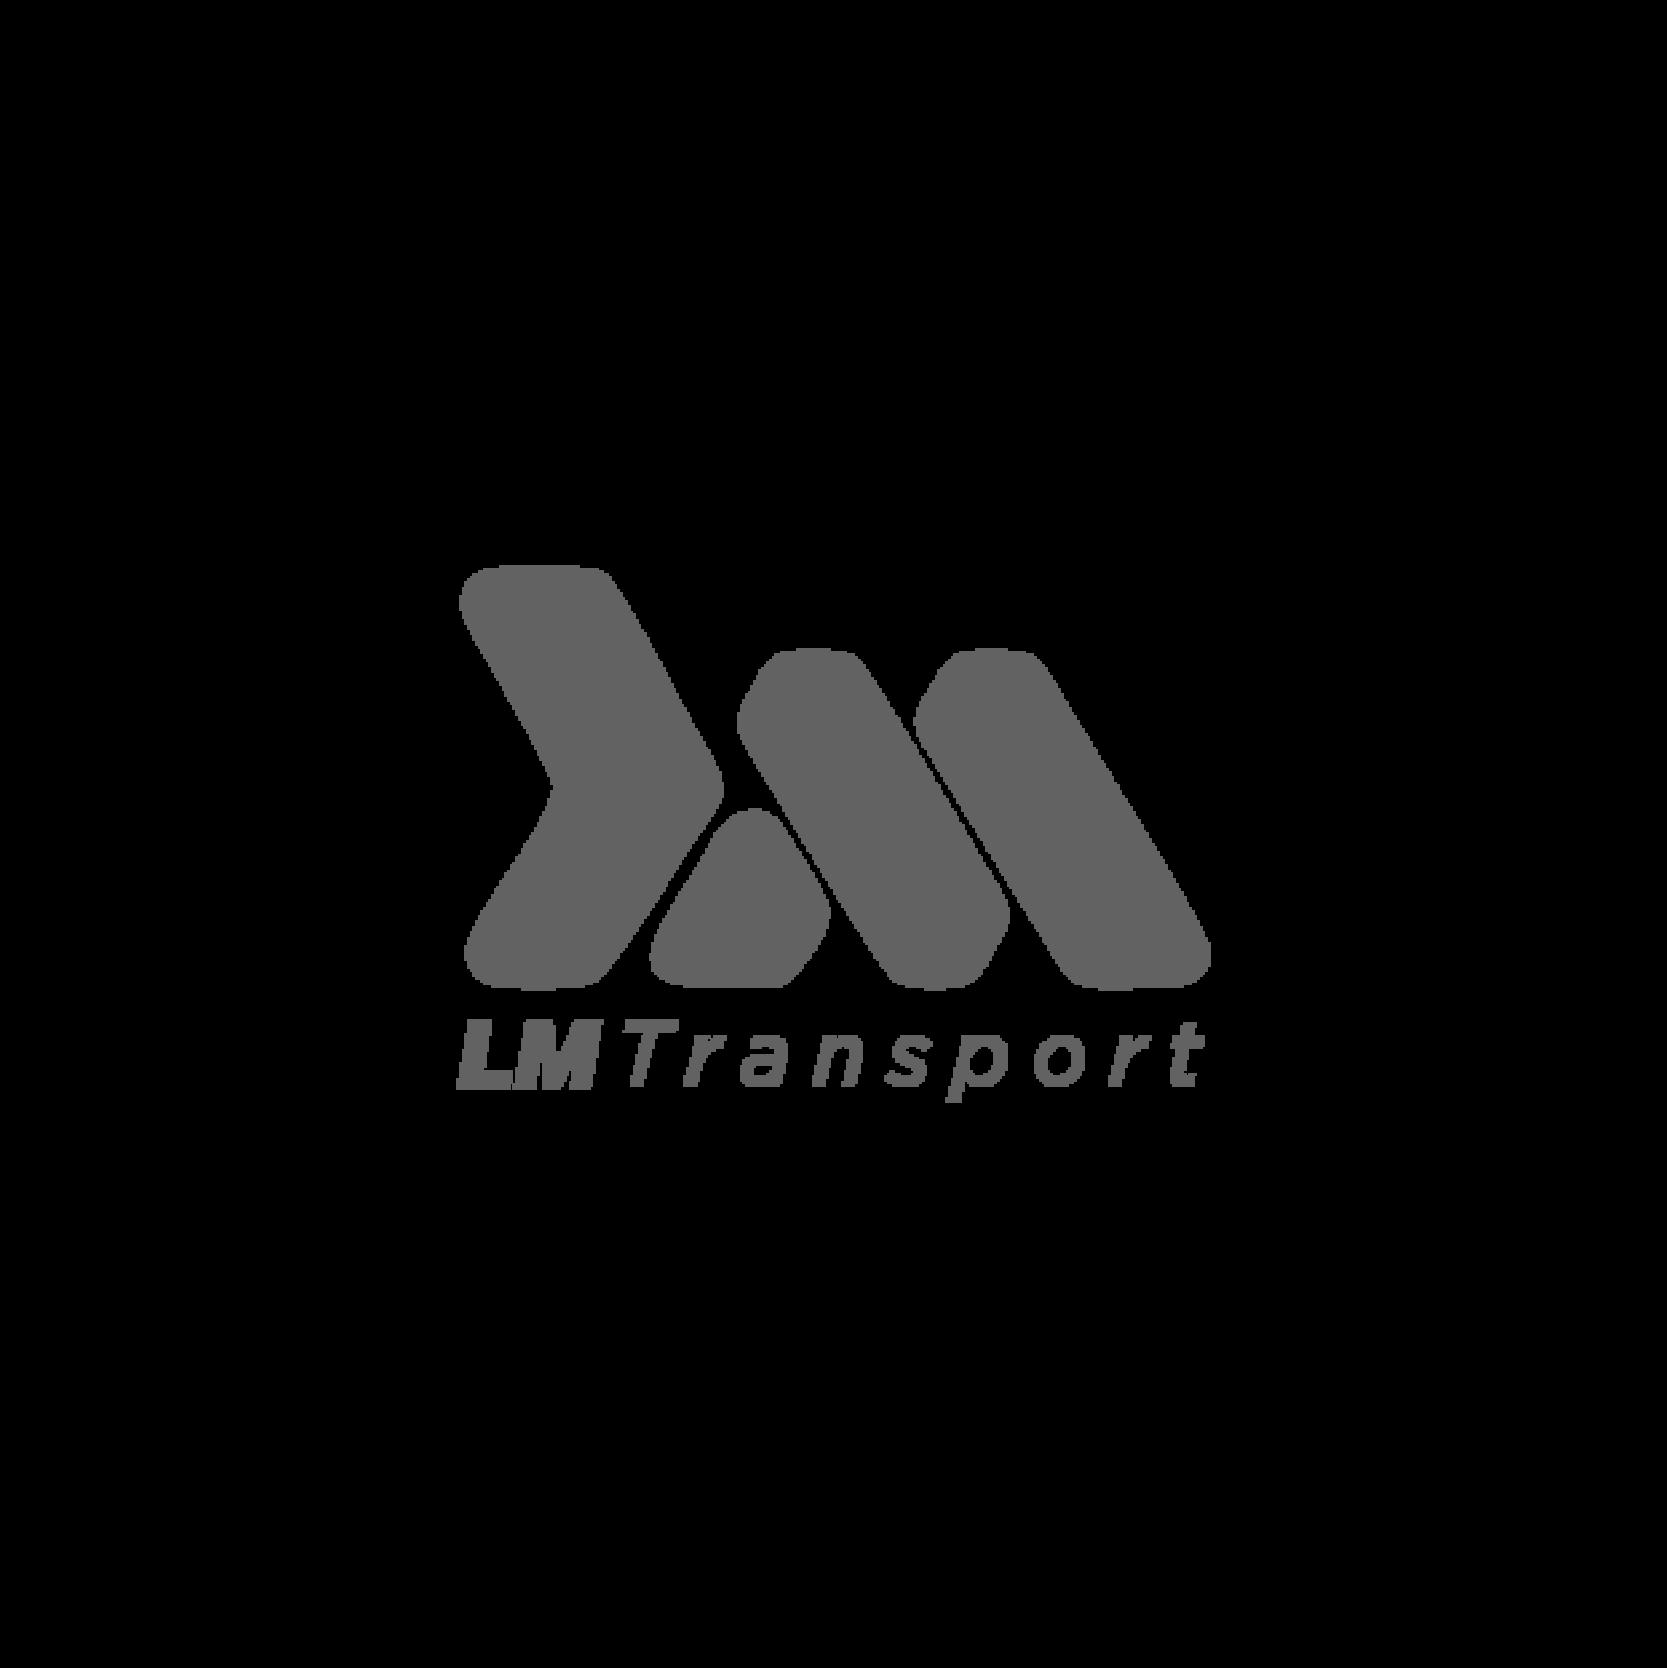 LMT Transport